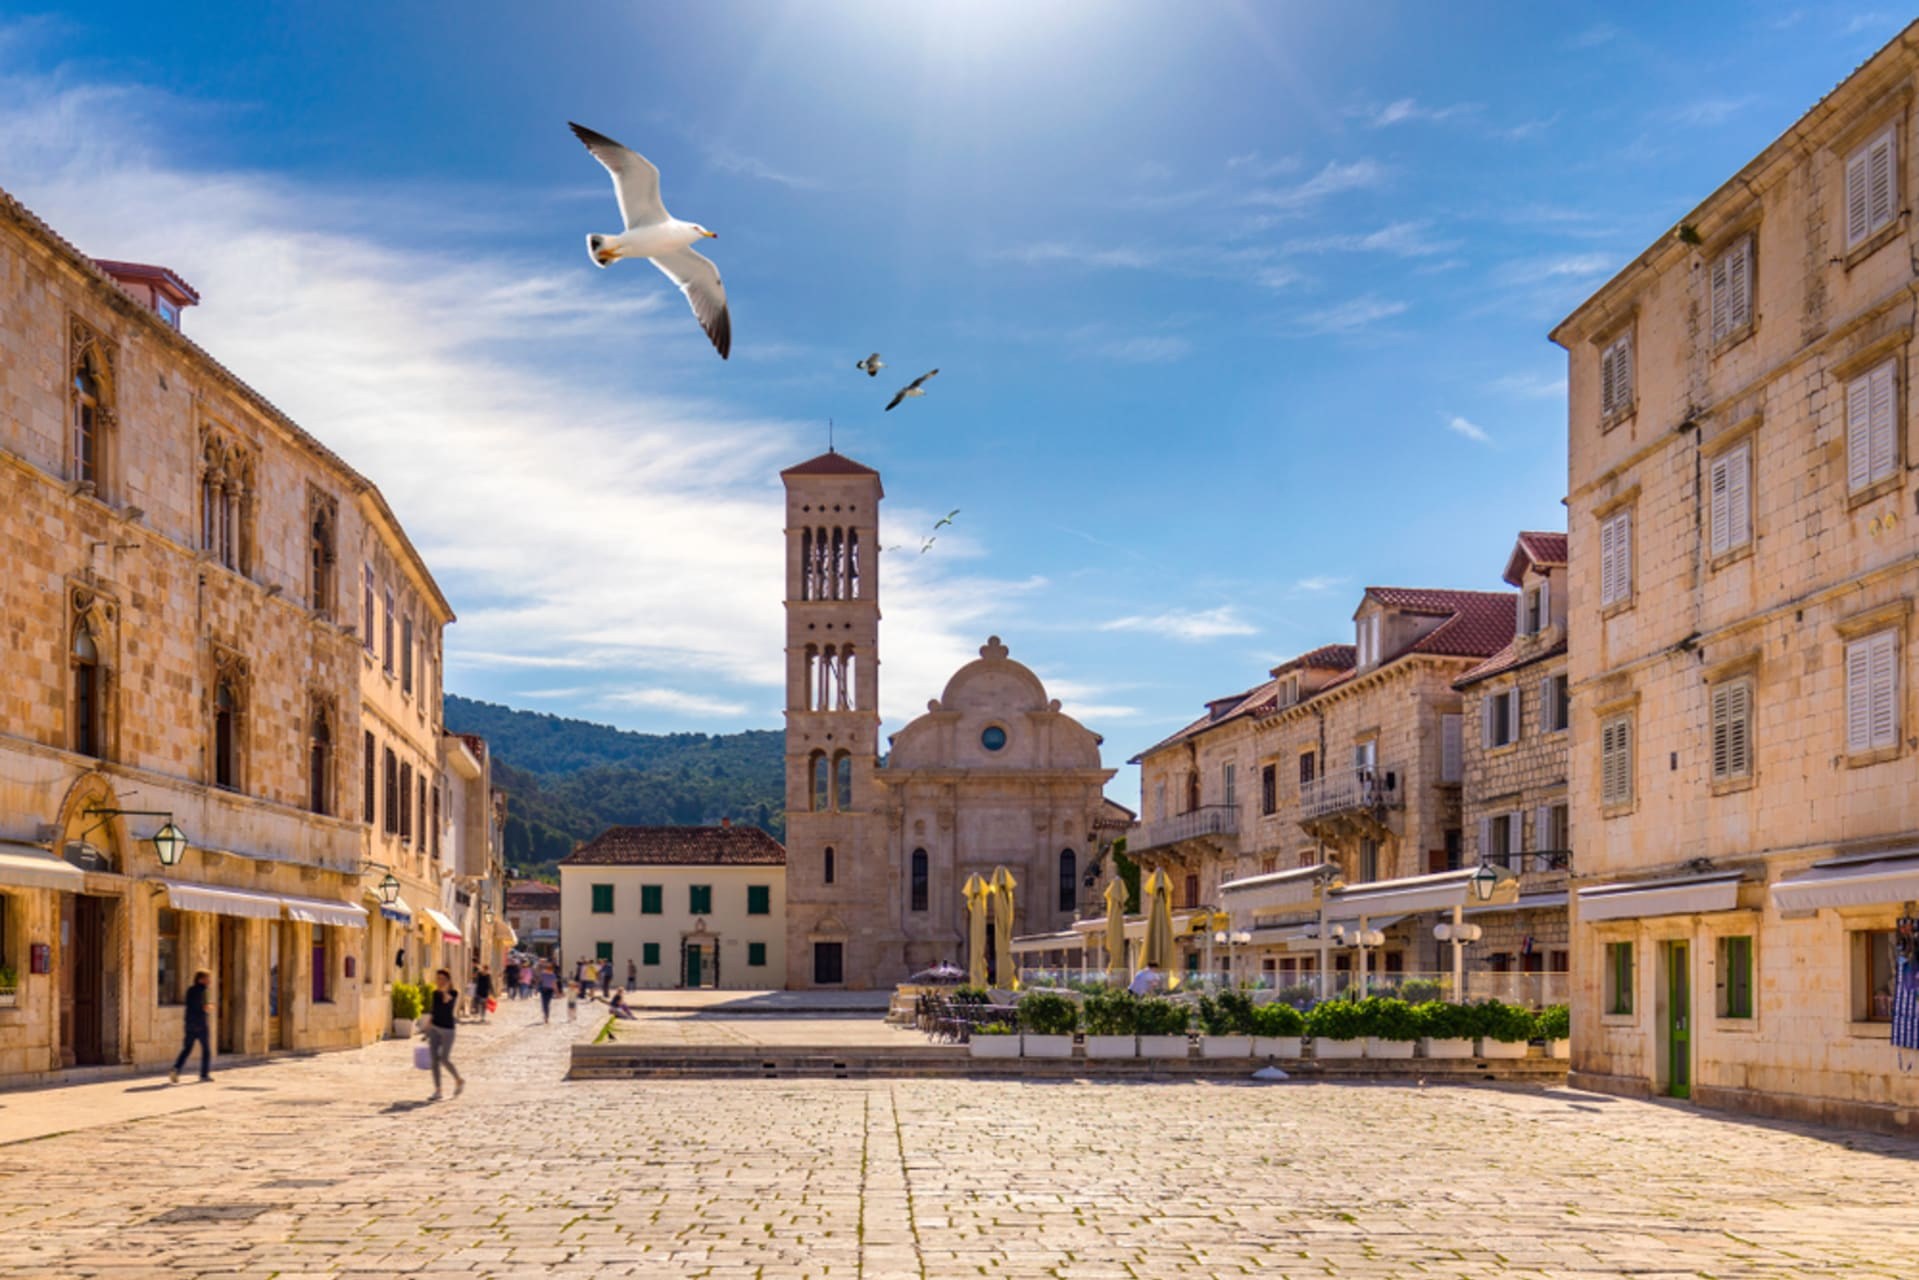 Hvar - Hvar – The Pearl of the Adriatic